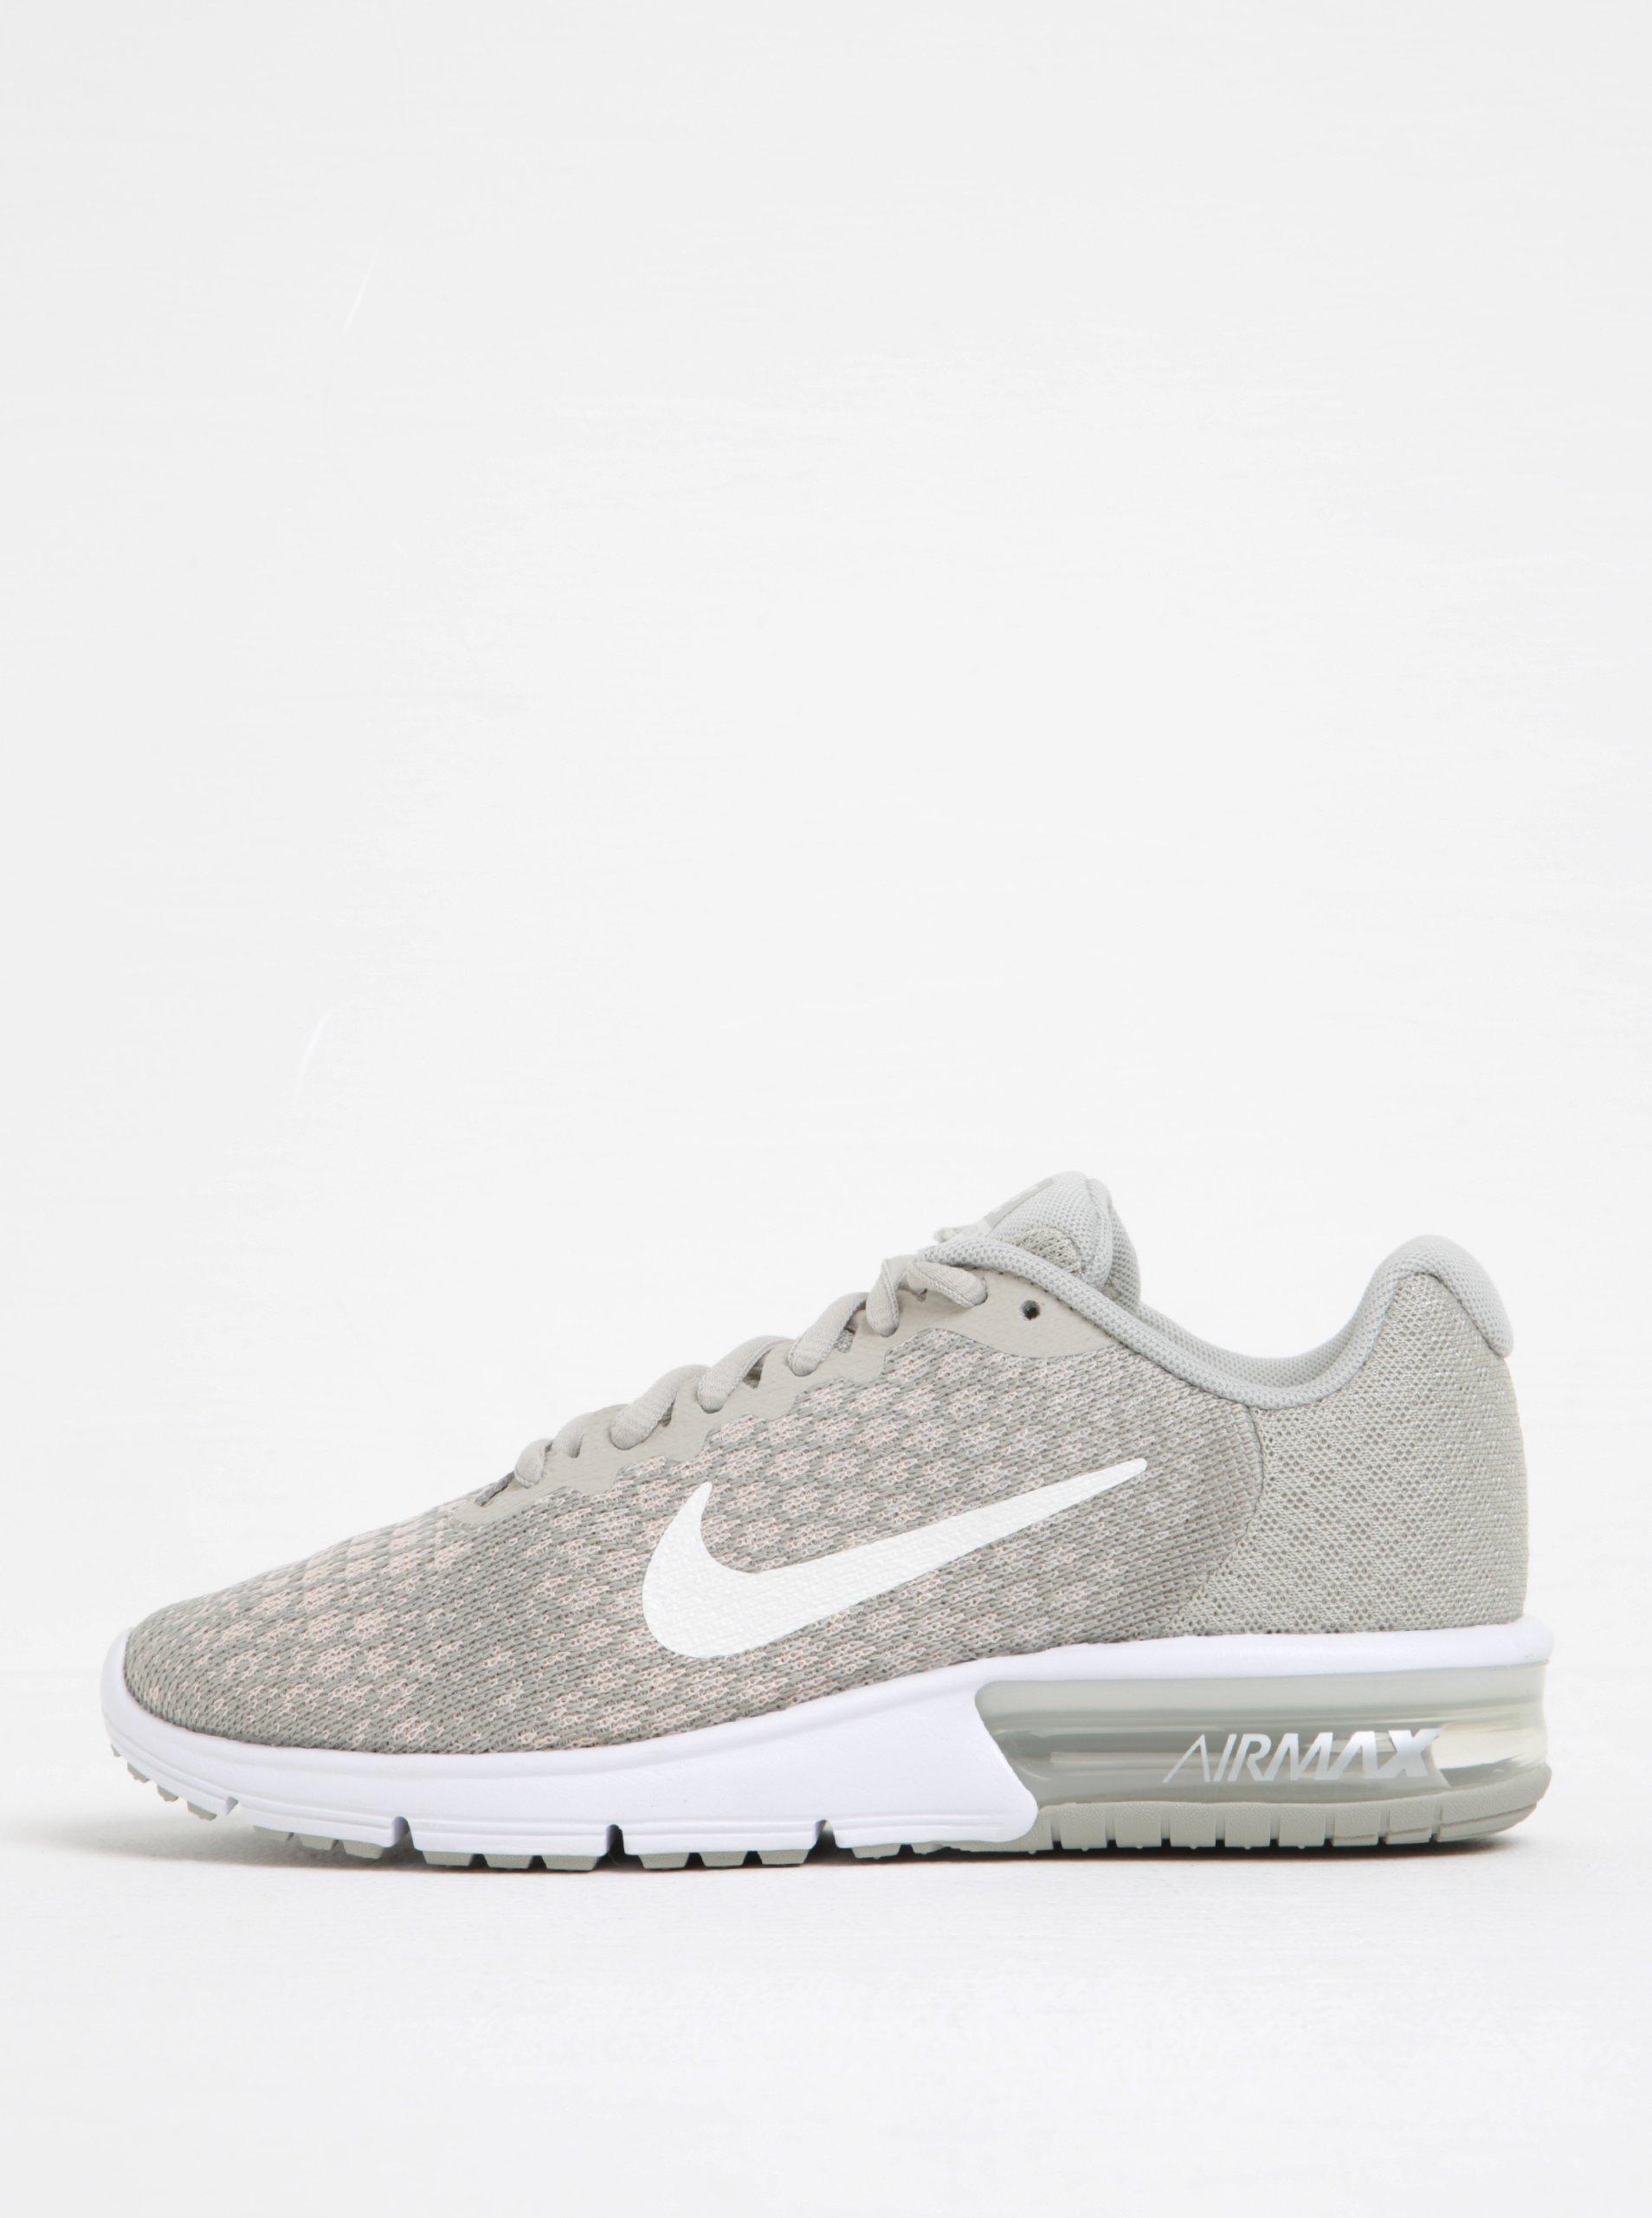 Světle šedé dámské žíhané tenisky Nike Air Max Sequent